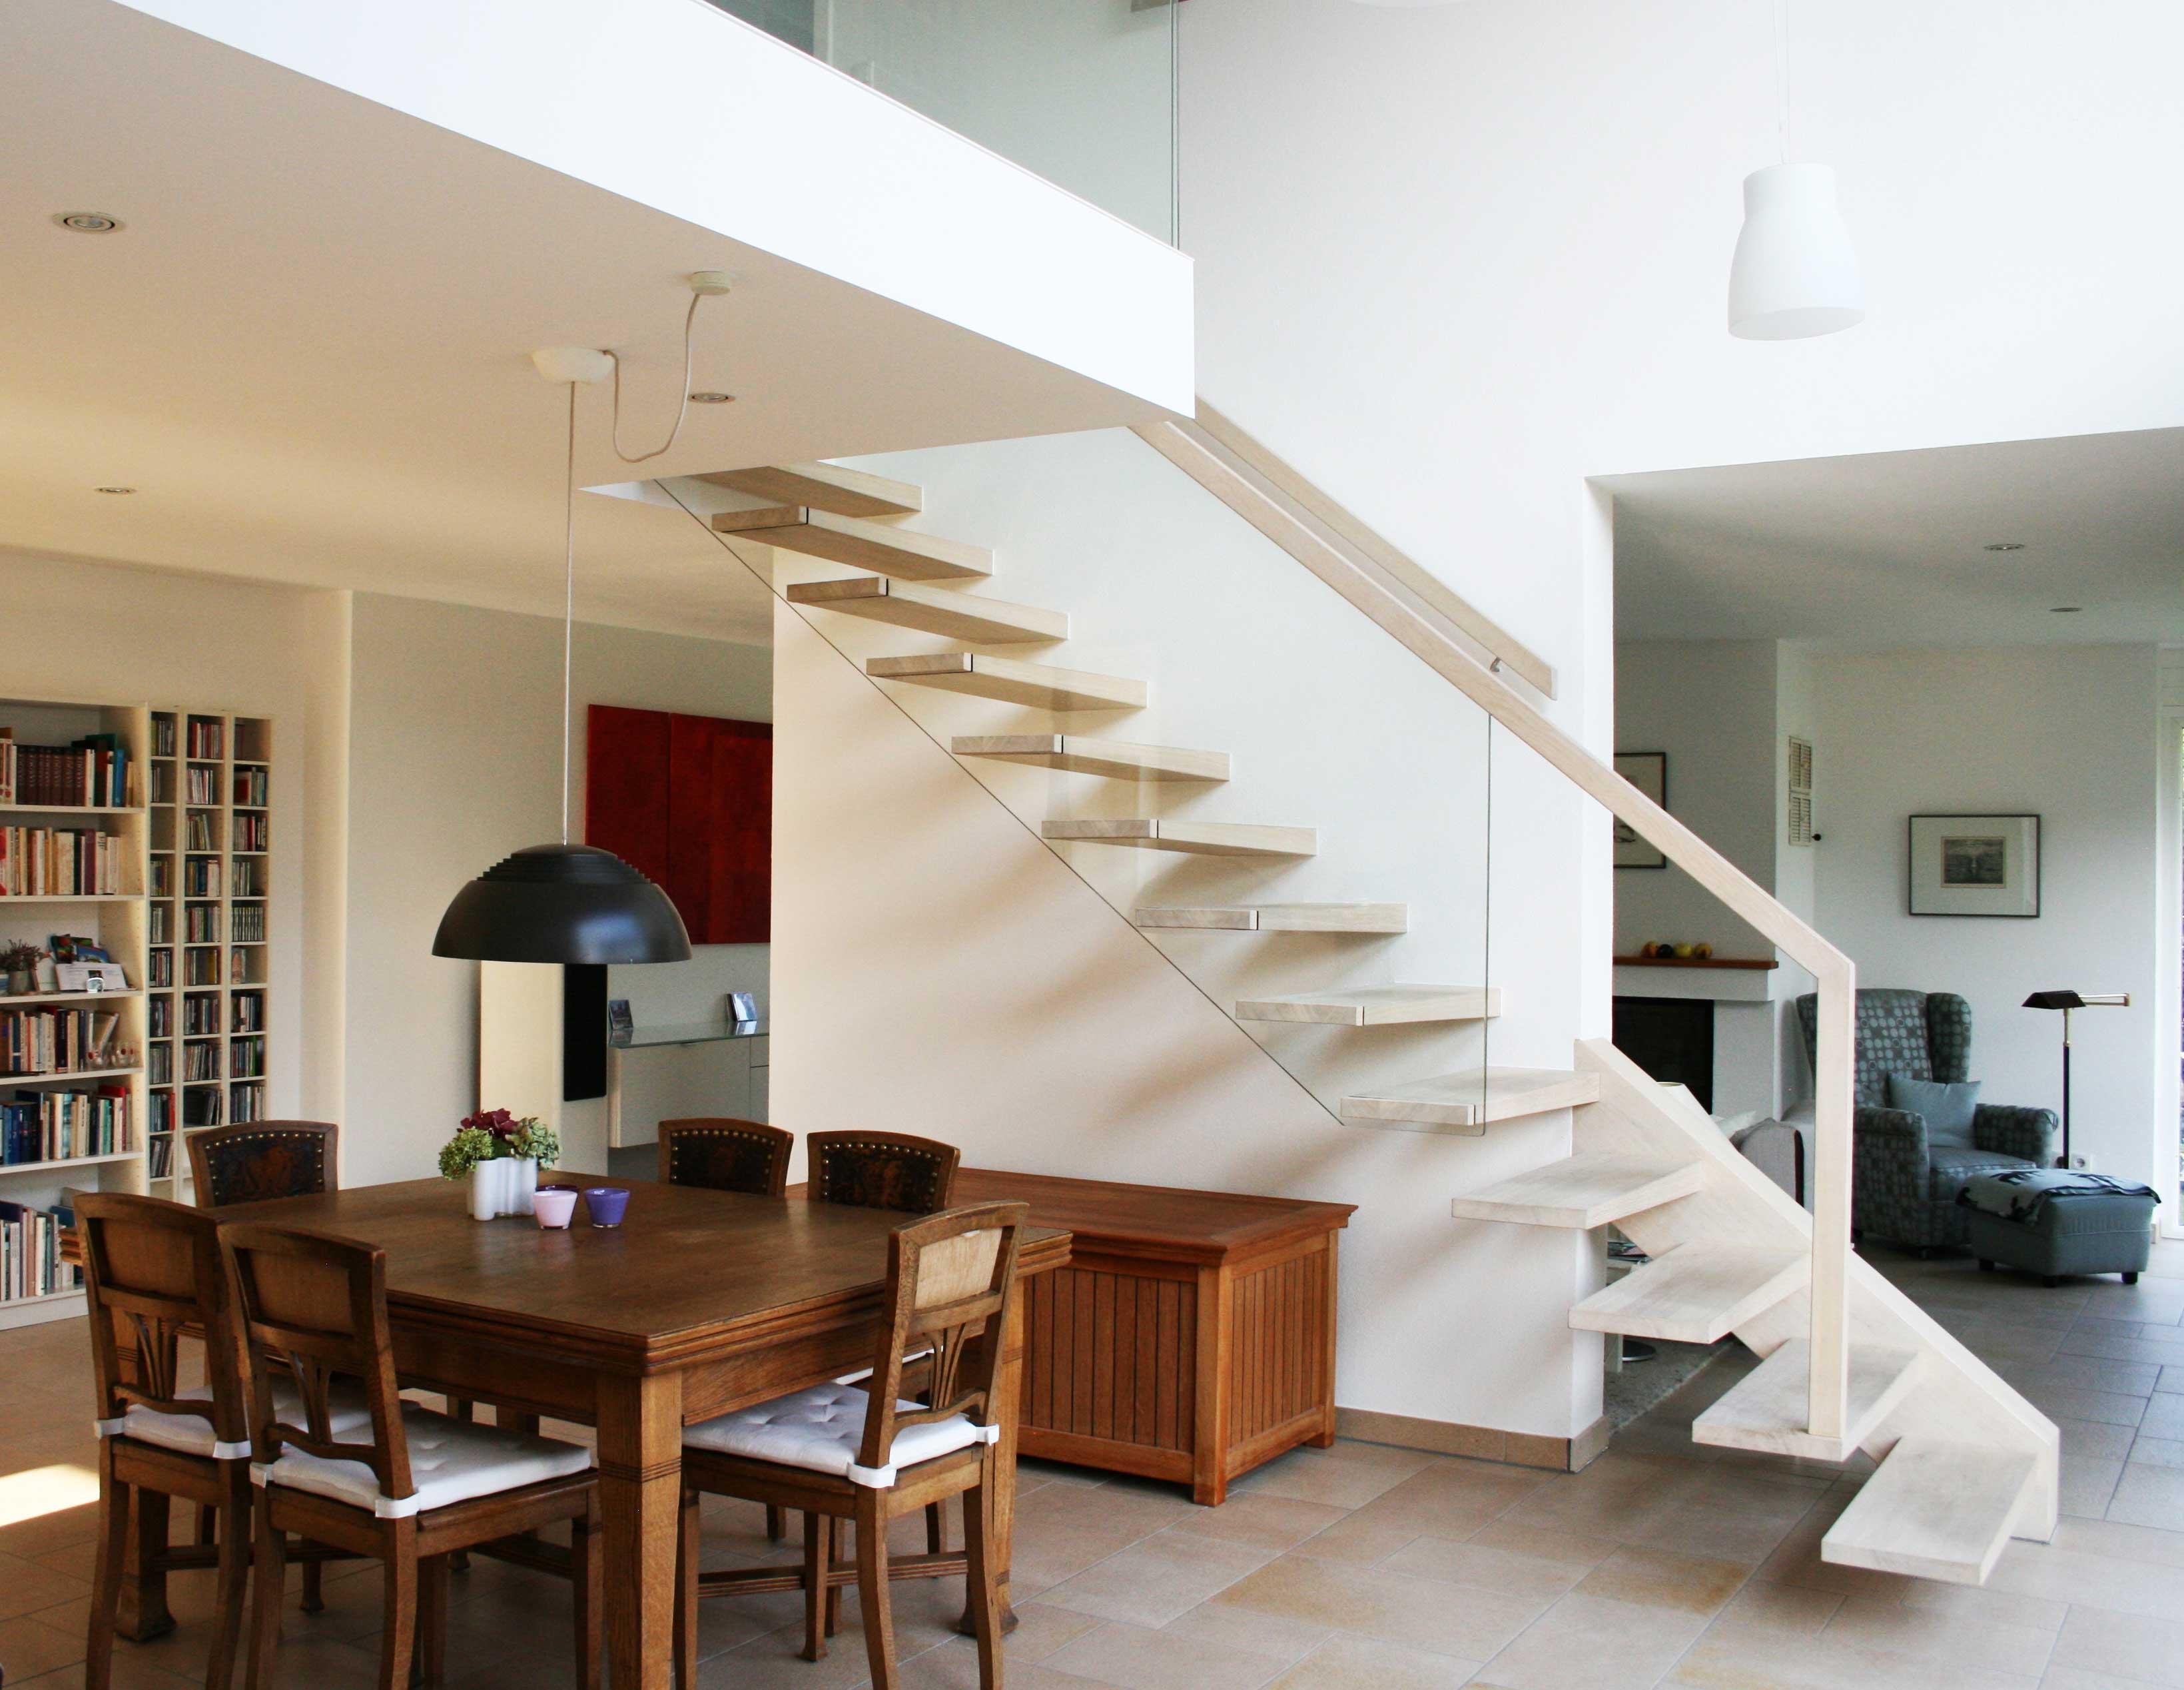 welche vorteile bieten holztreppen das angesagte material holz. Black Bedroom Furniture Sets. Home Design Ideas